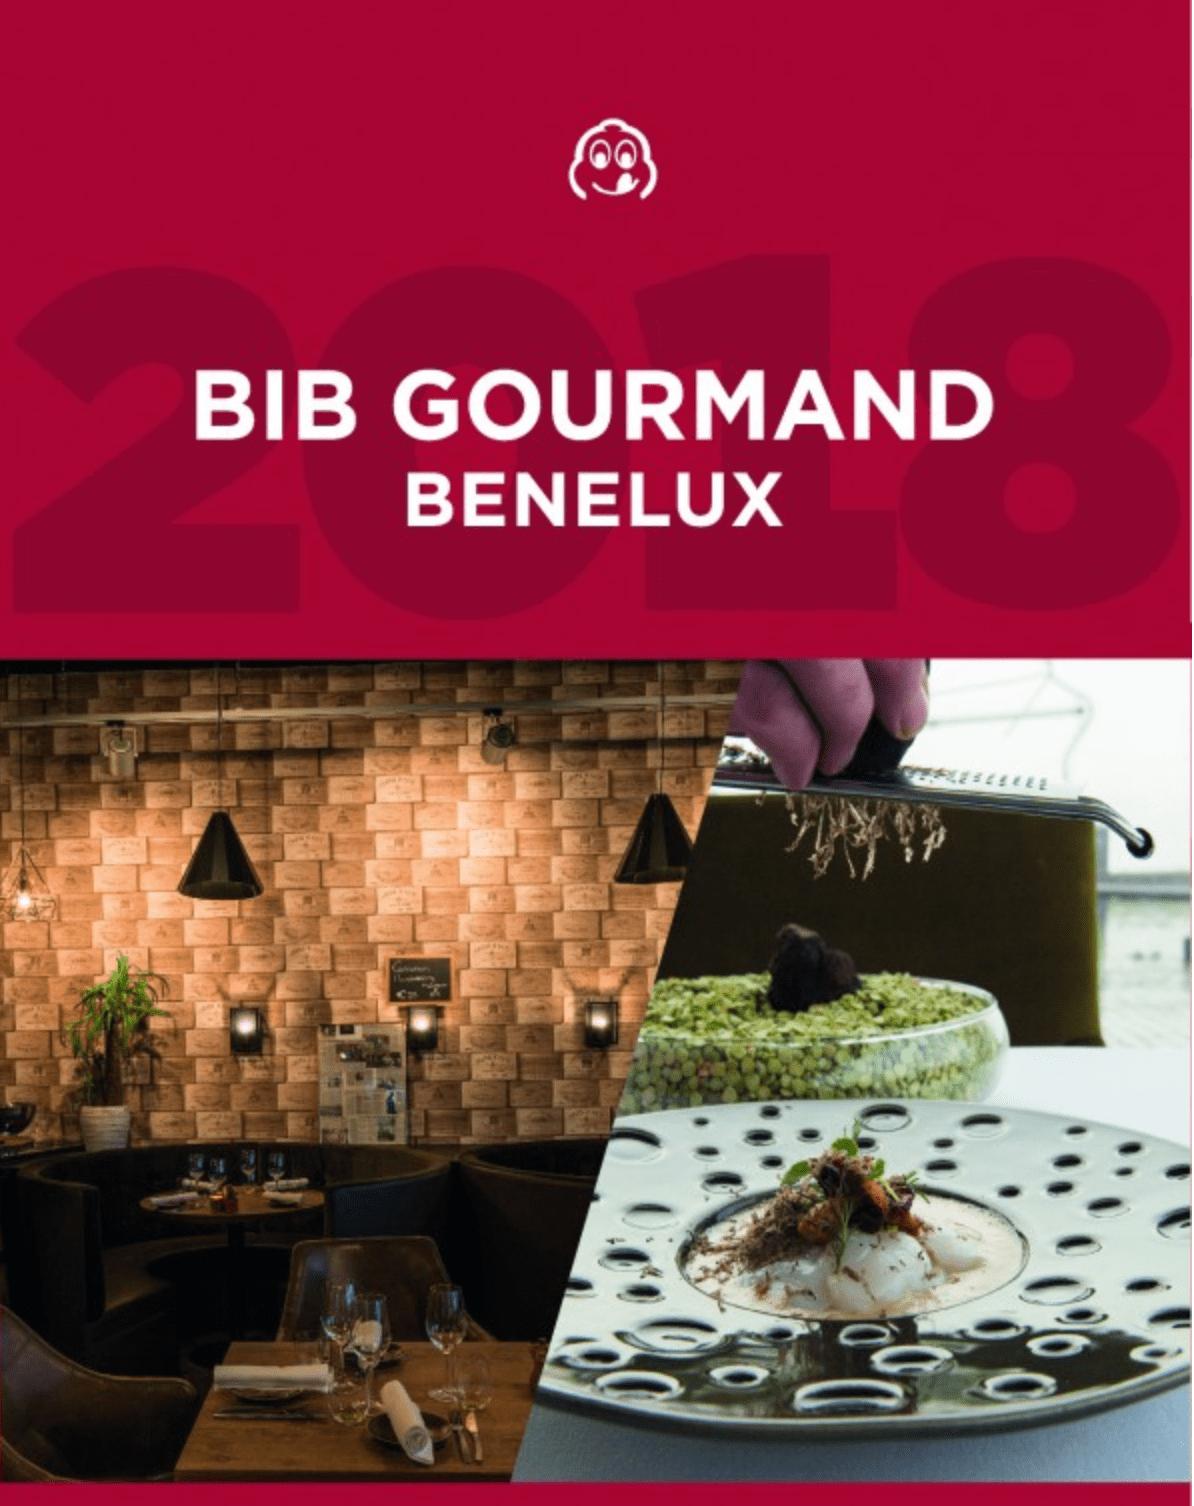 BIB gourmands Benelux Michelin 2019